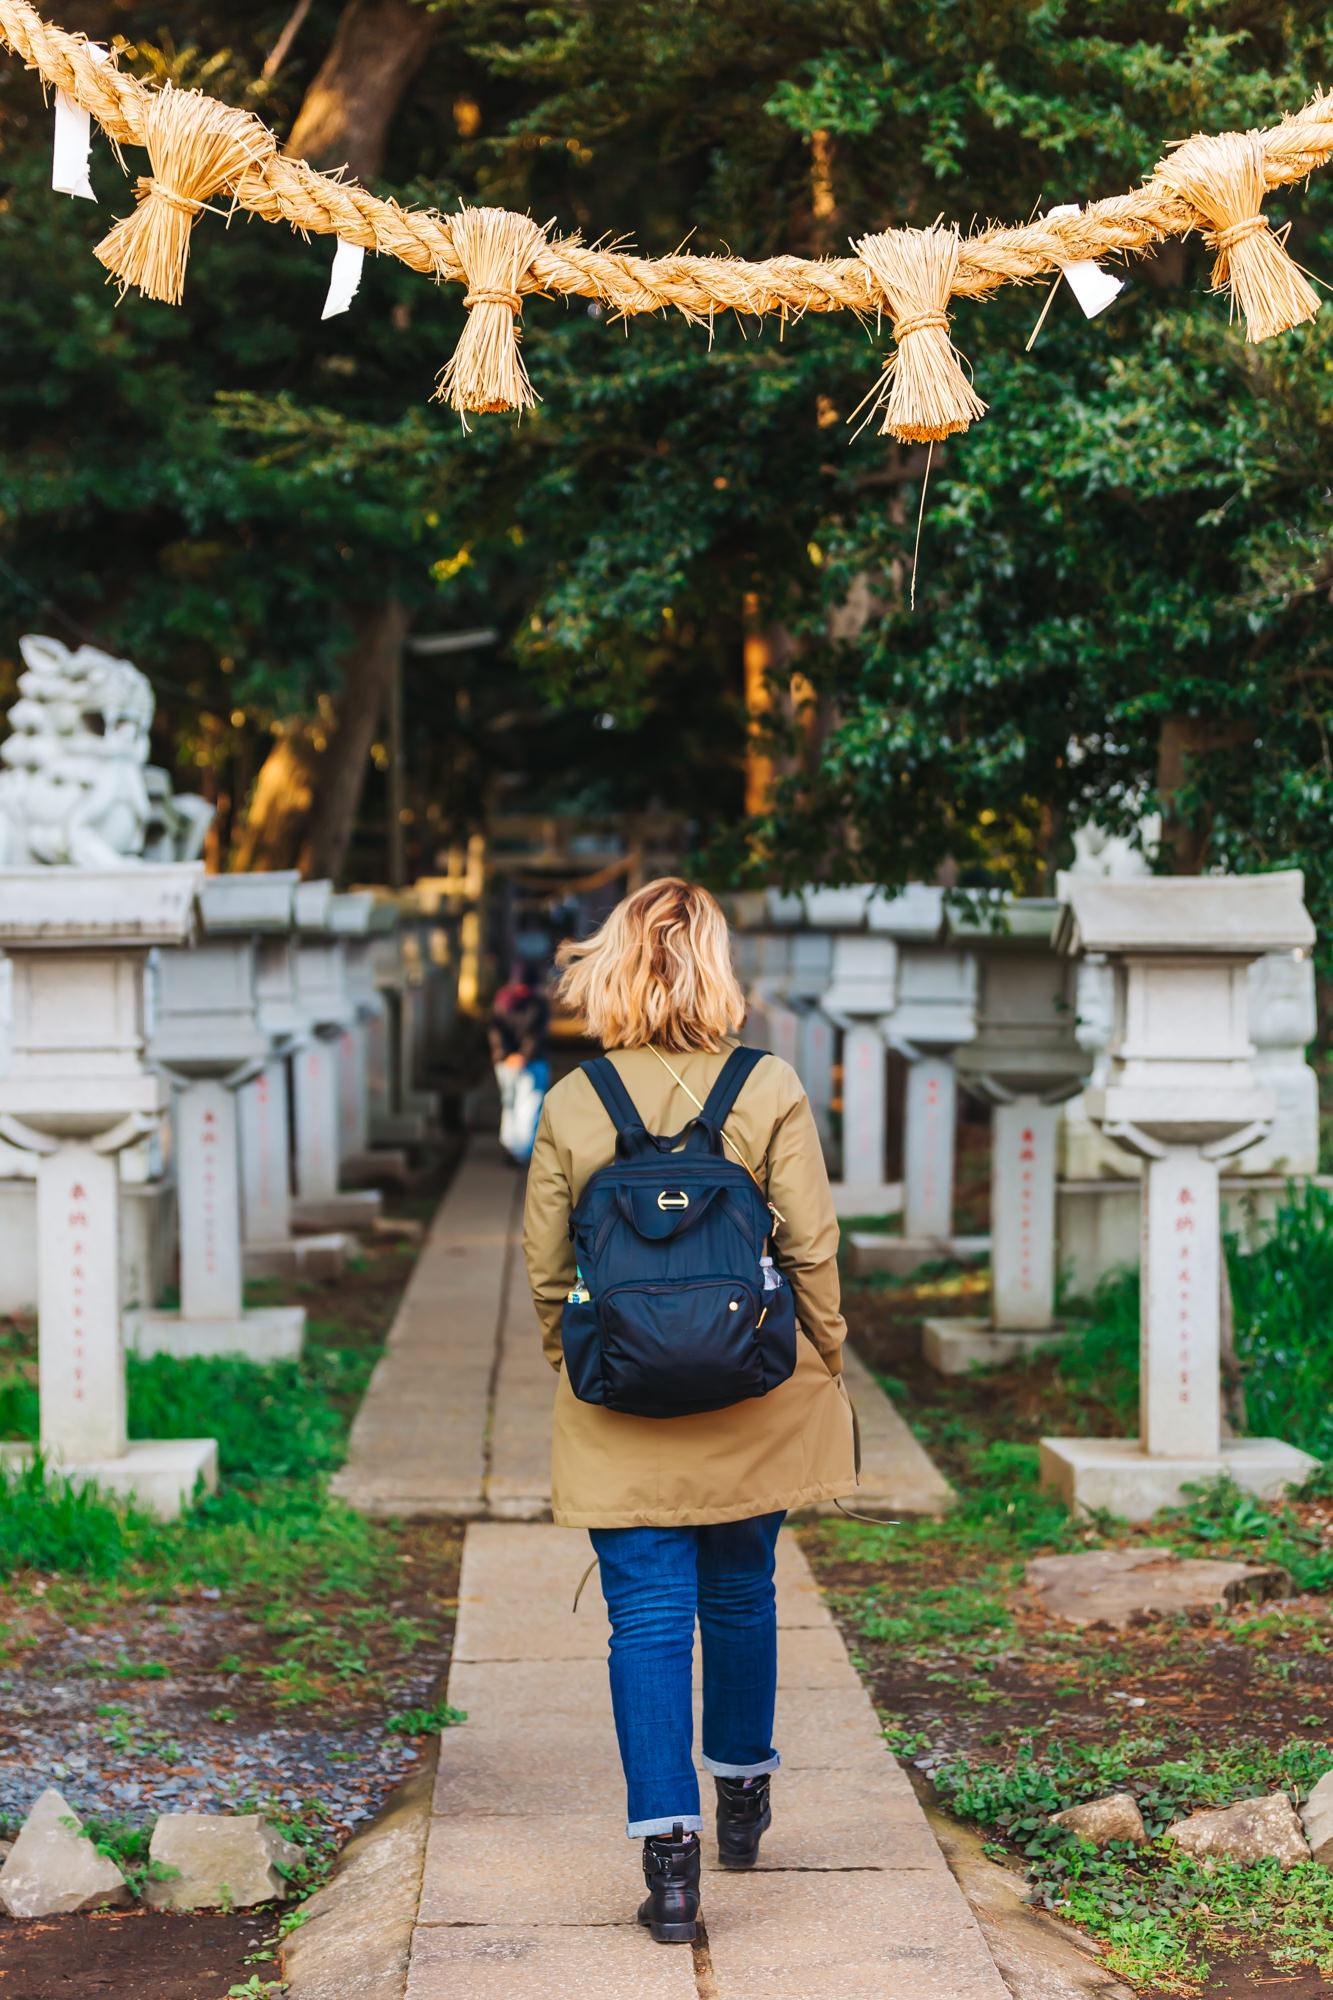 Anatomie   Jacket     | Pacsafe   Citysafe Anti-Theft Backpack     | Union bay     Denim